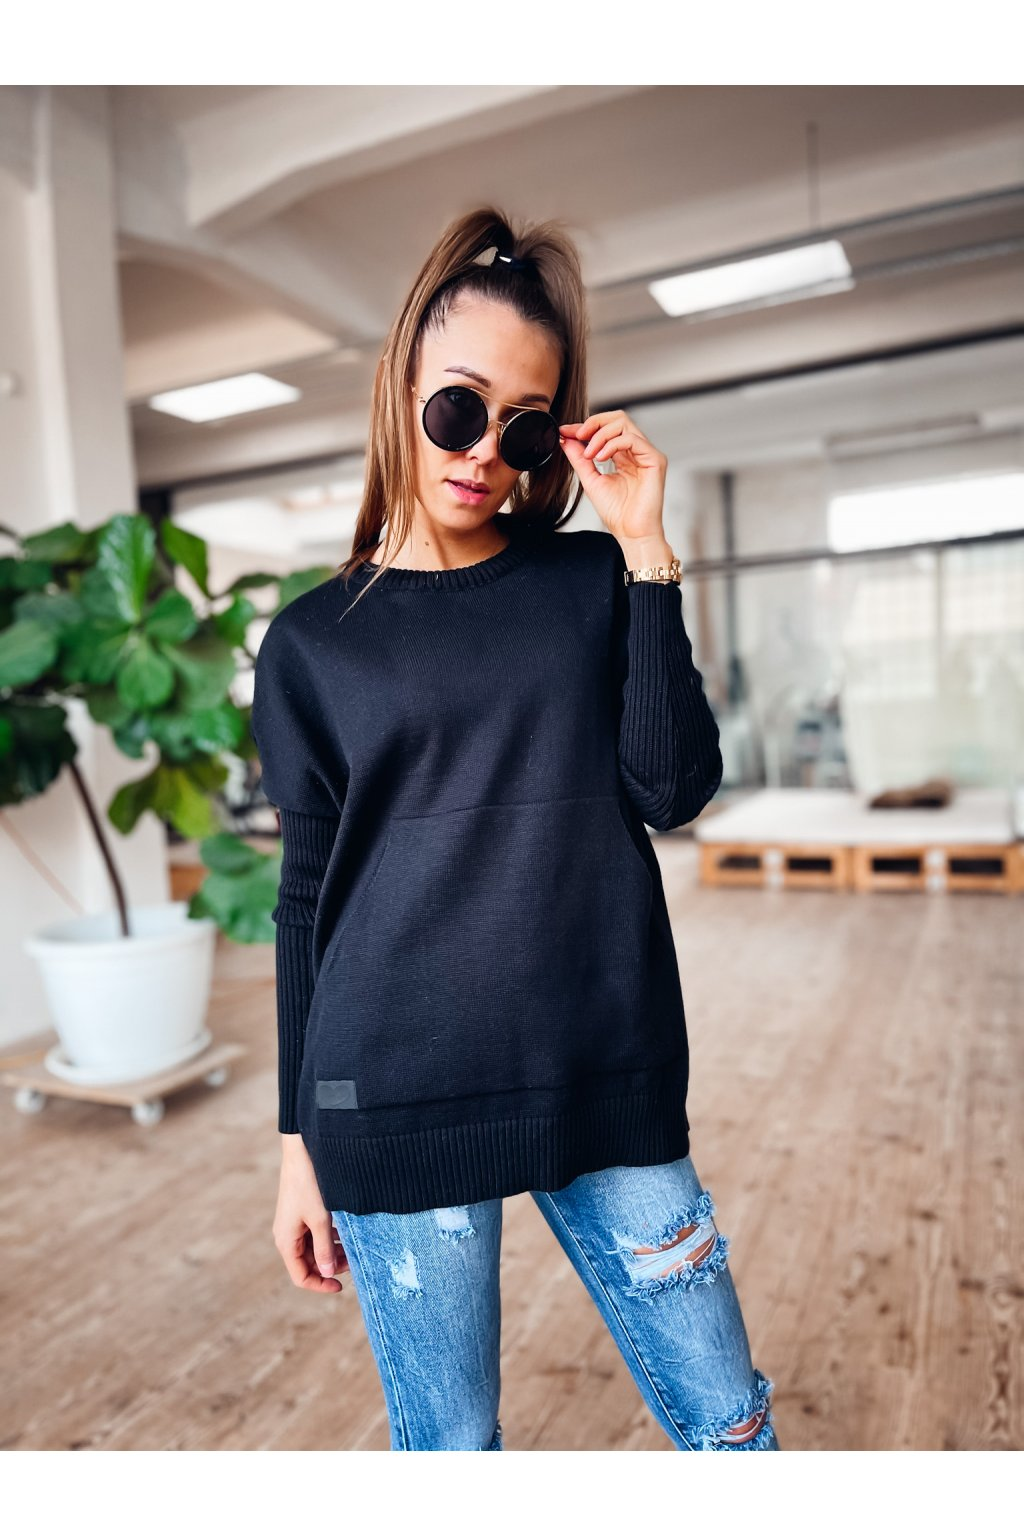 damsky svetr s kapsou spring black eshopat cz 1